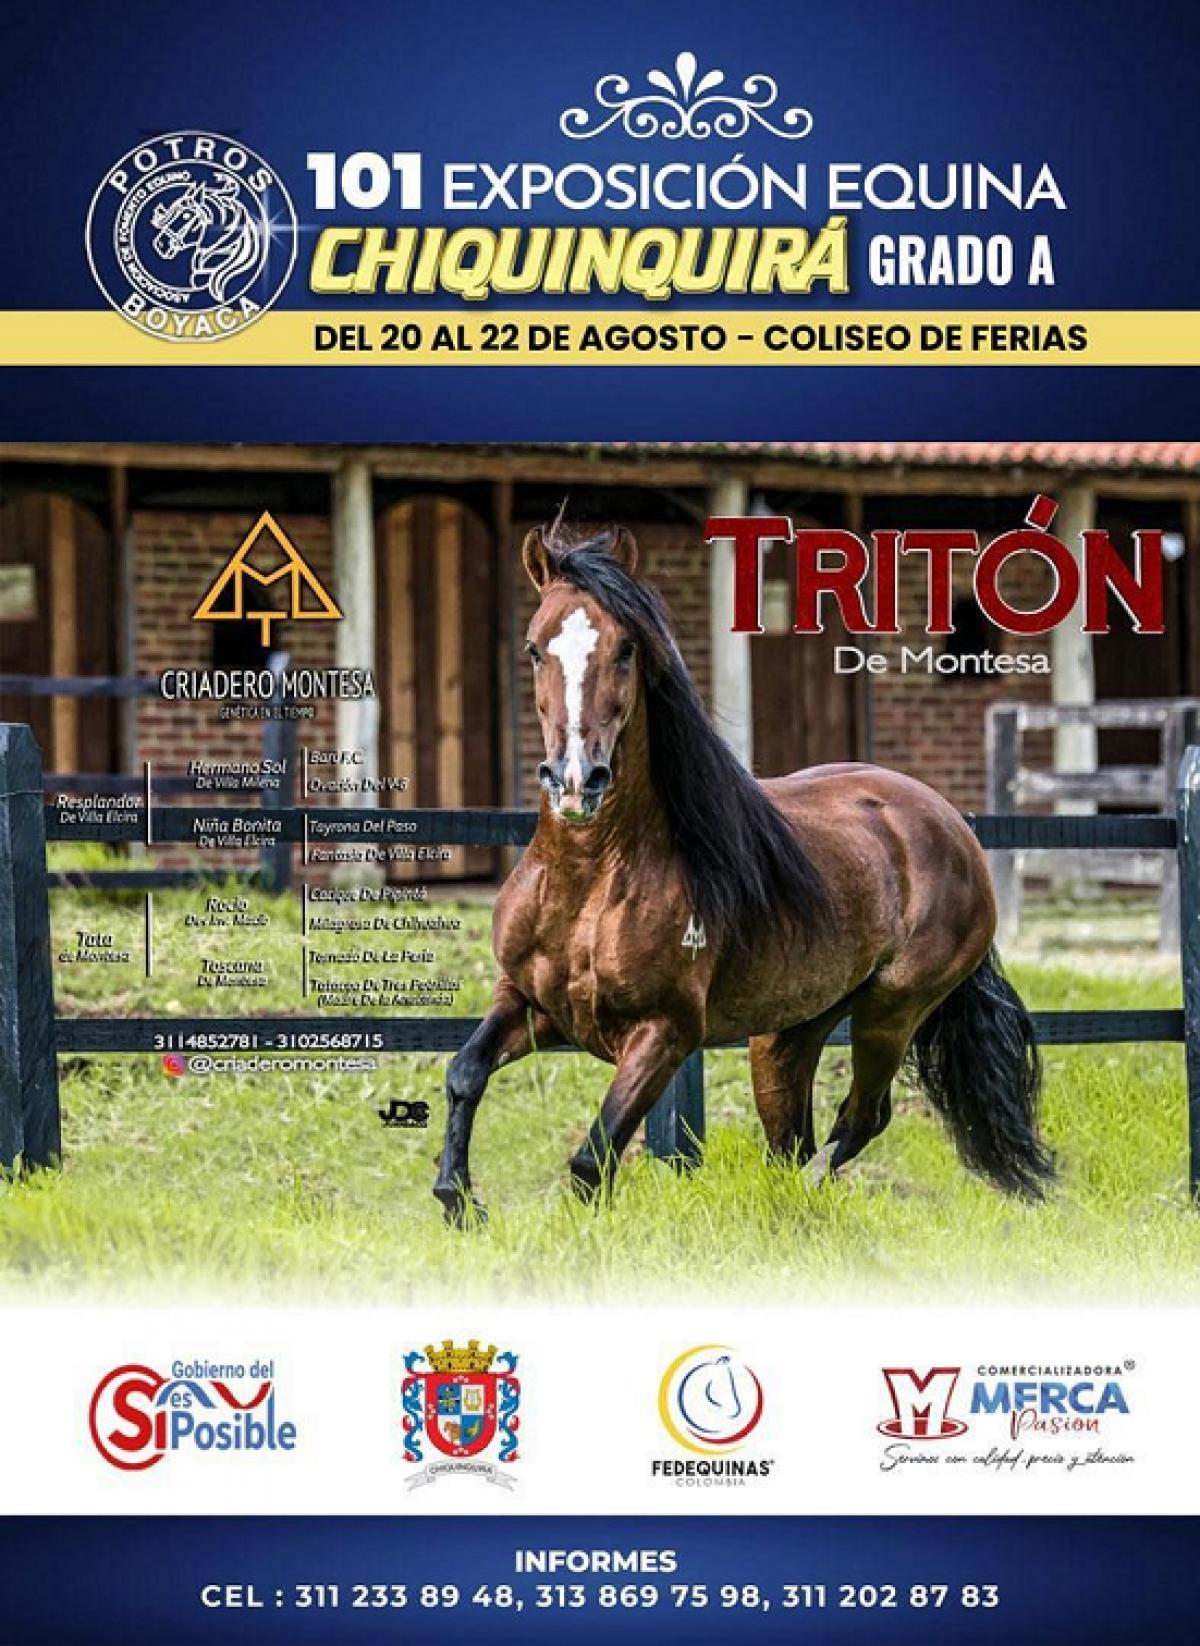 101 Exposición Equina Chiquinquirá 2021